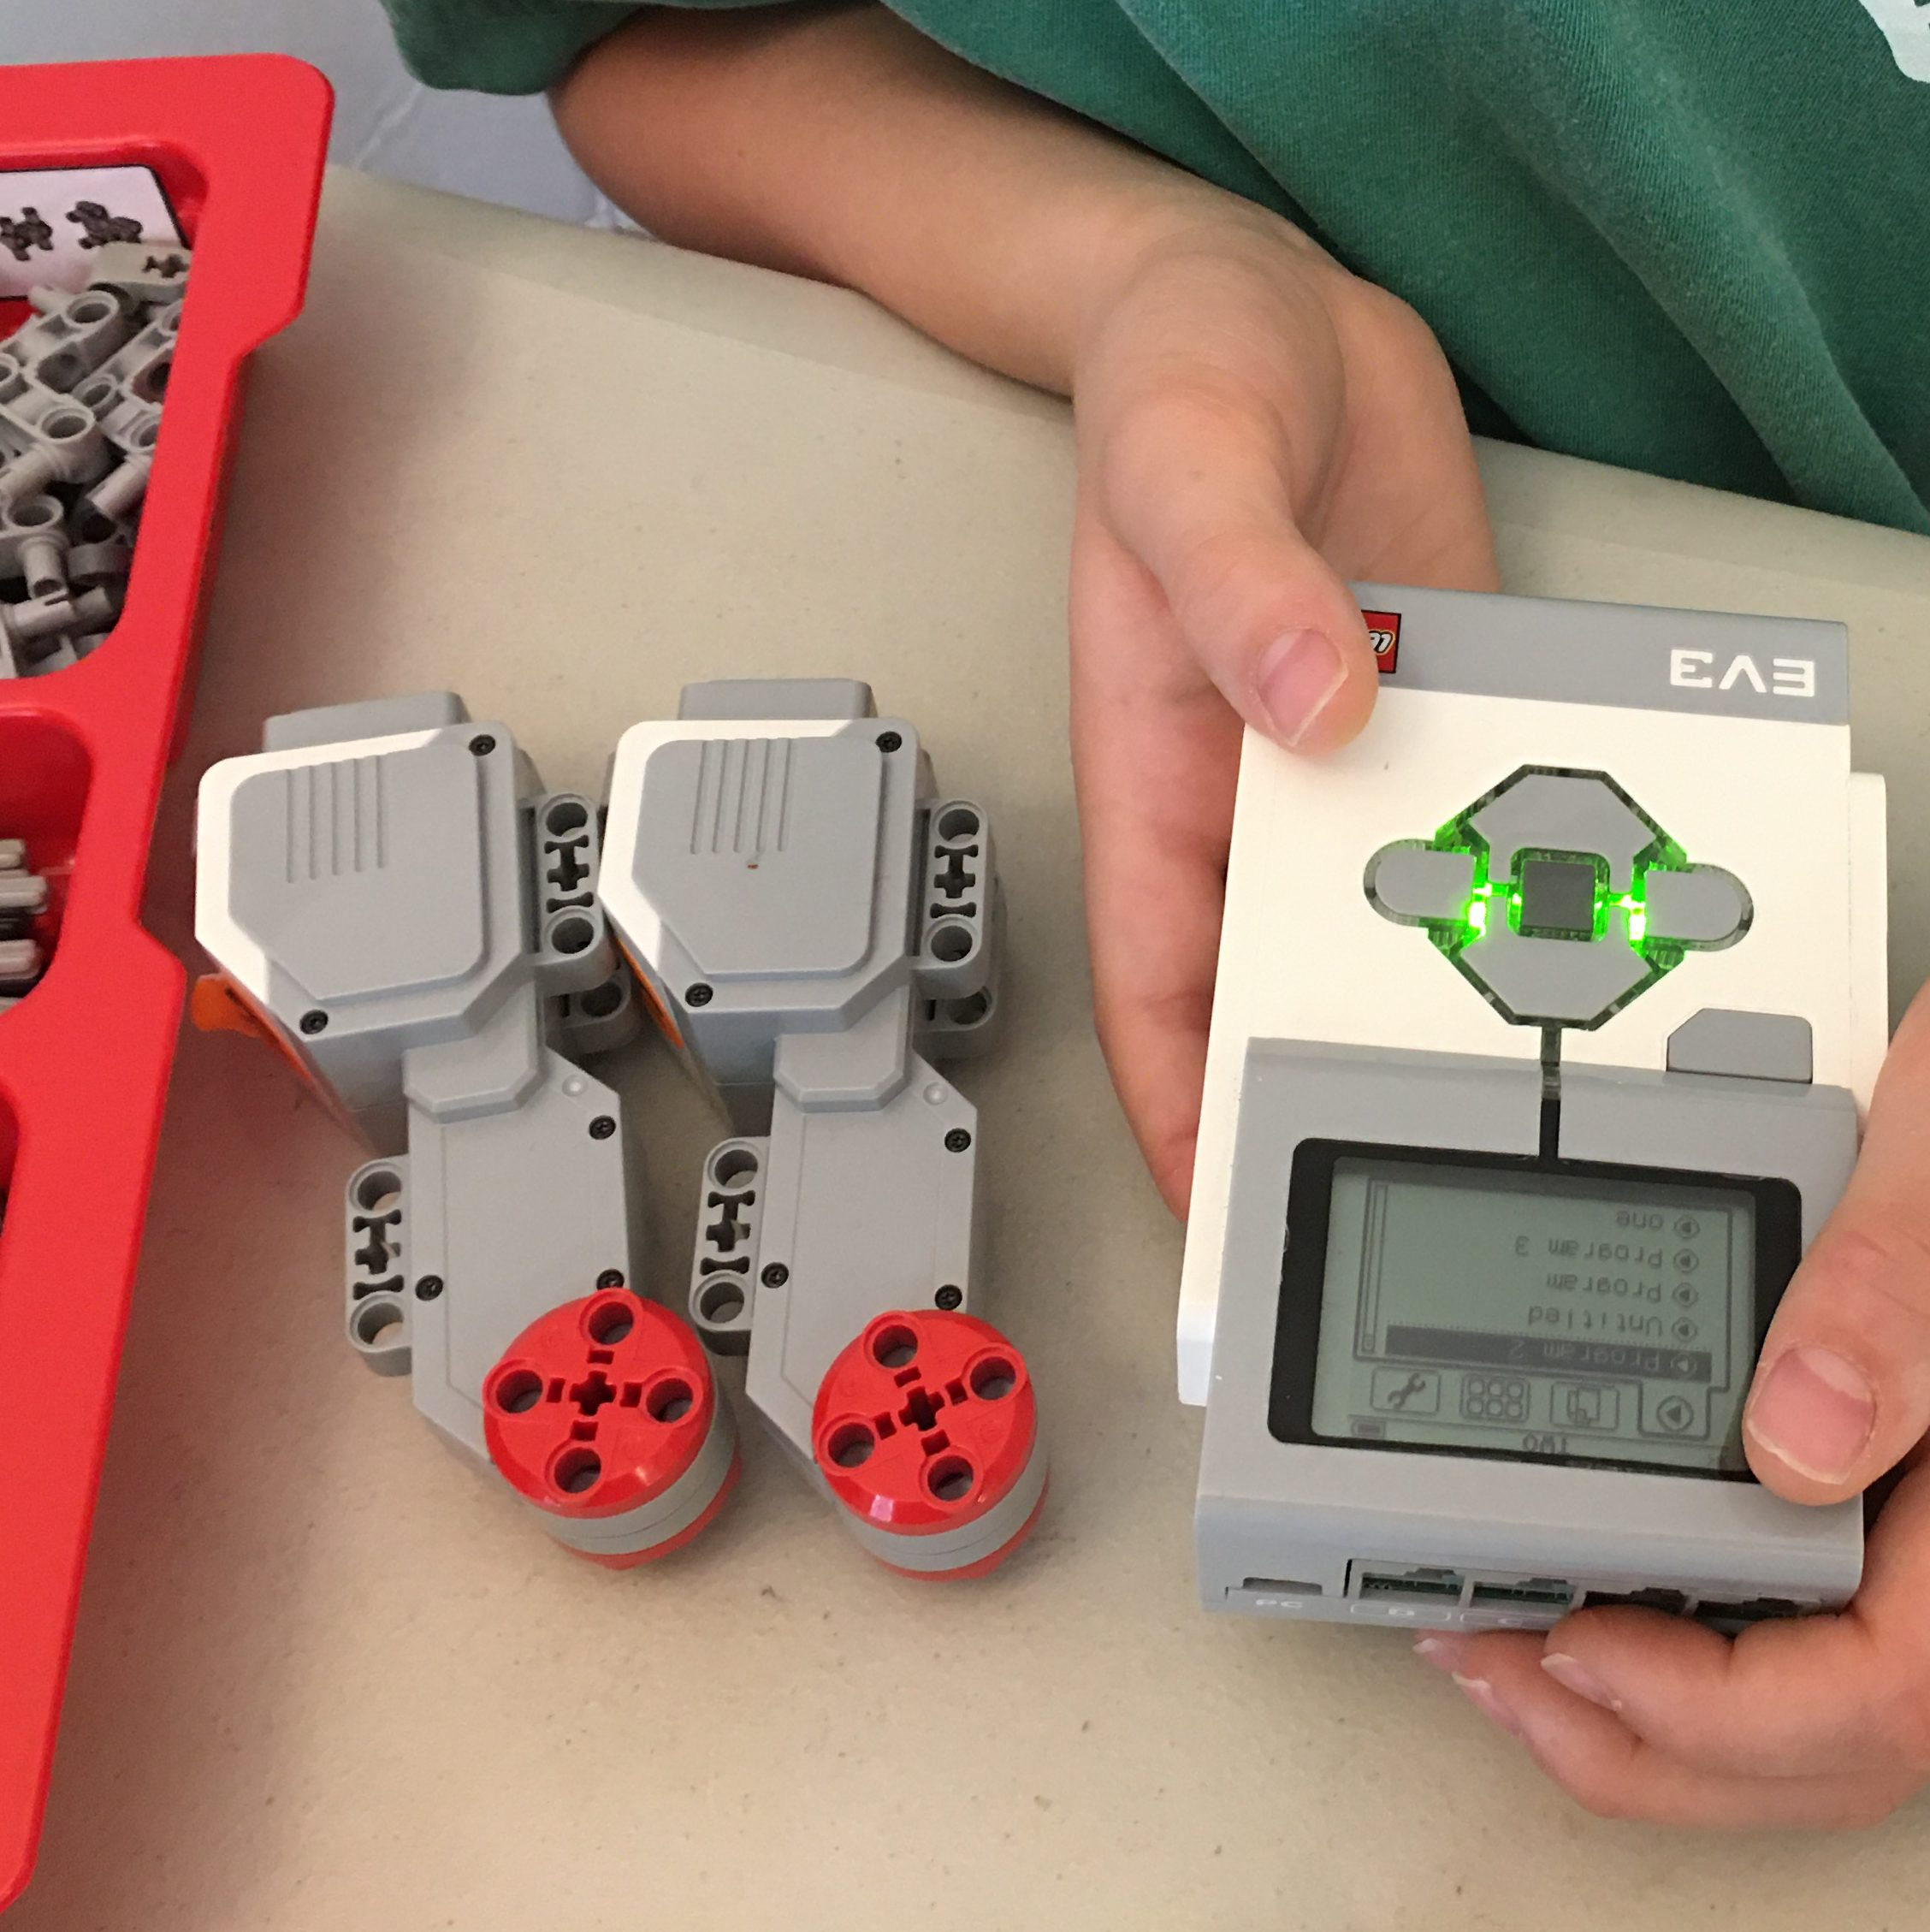 student programming ev3 robot